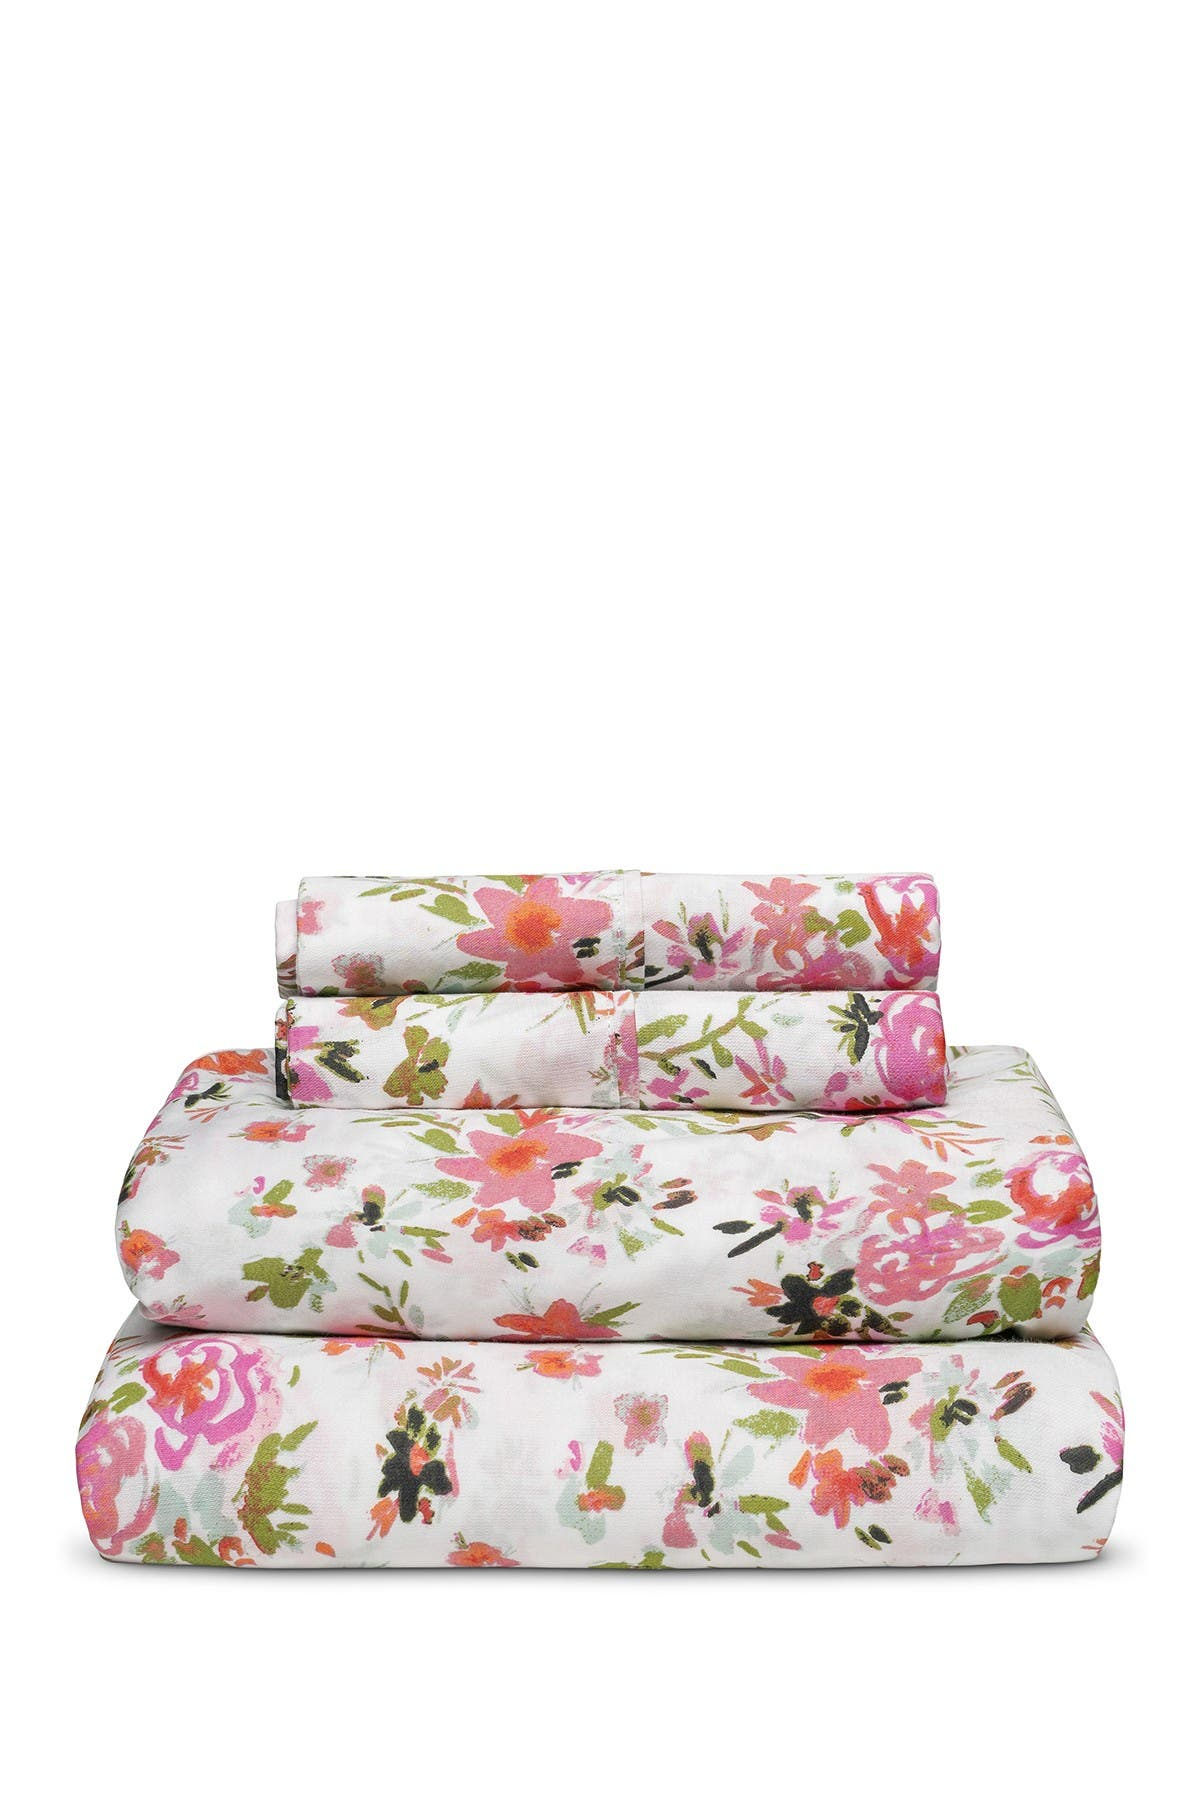 Image of Melange Home 300 Thread Count Wild Love Multi Queen Sheet Set